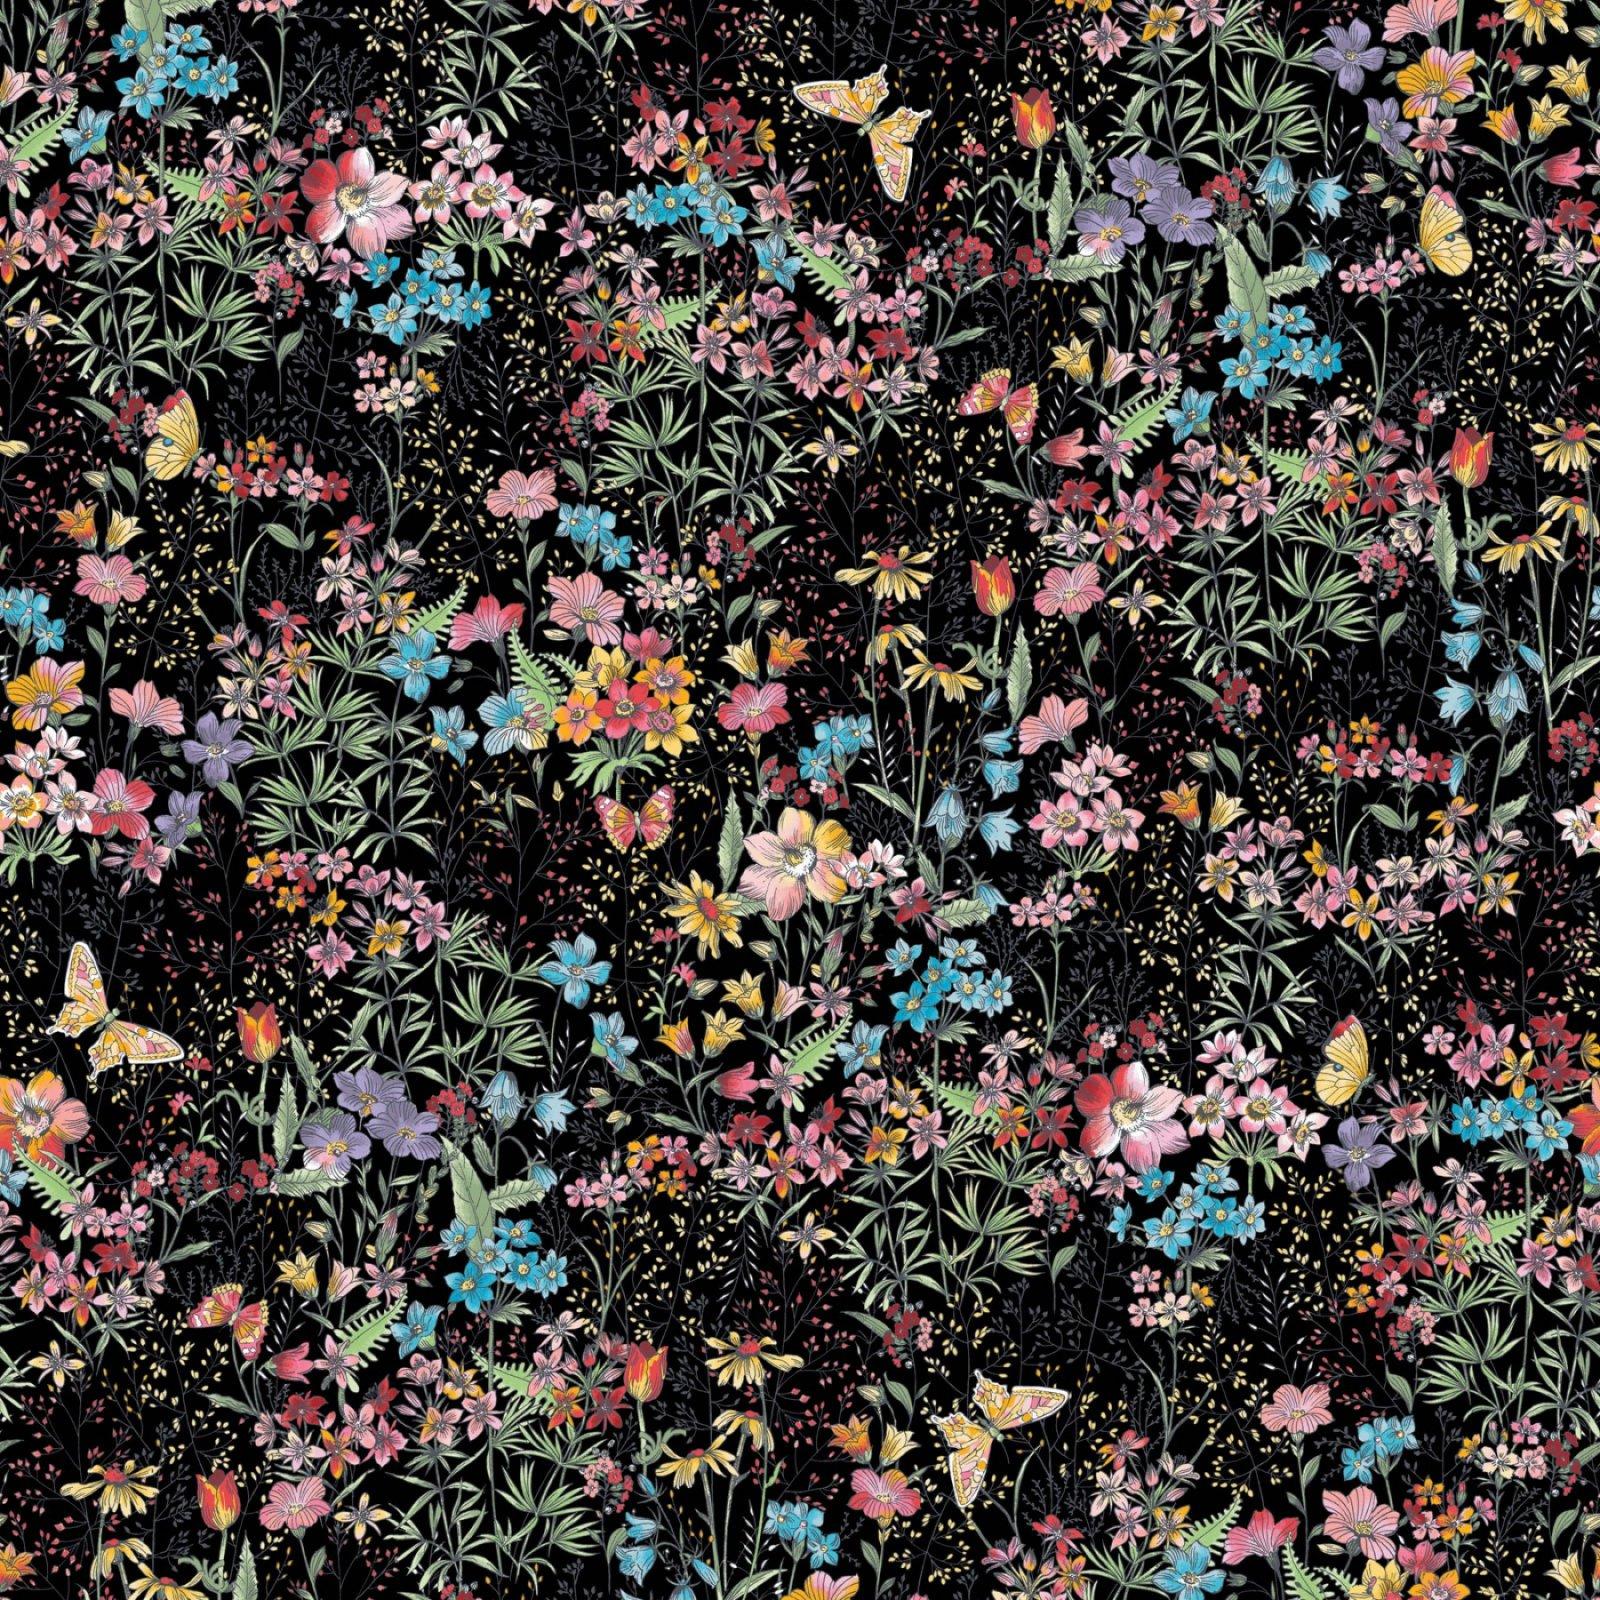 MEADOW EDGE LARGE MEADOW FLOWER BLACK